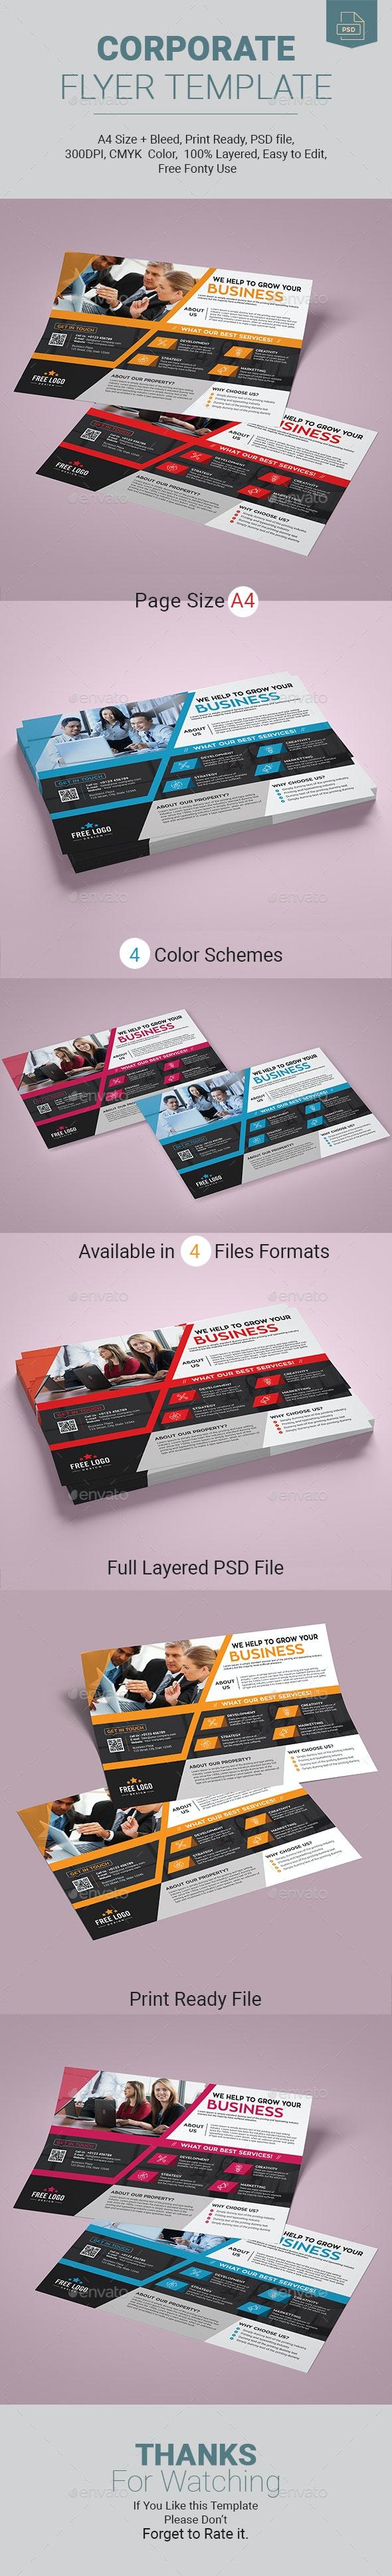 Corporate Flyer Template - Corporate Business Cards